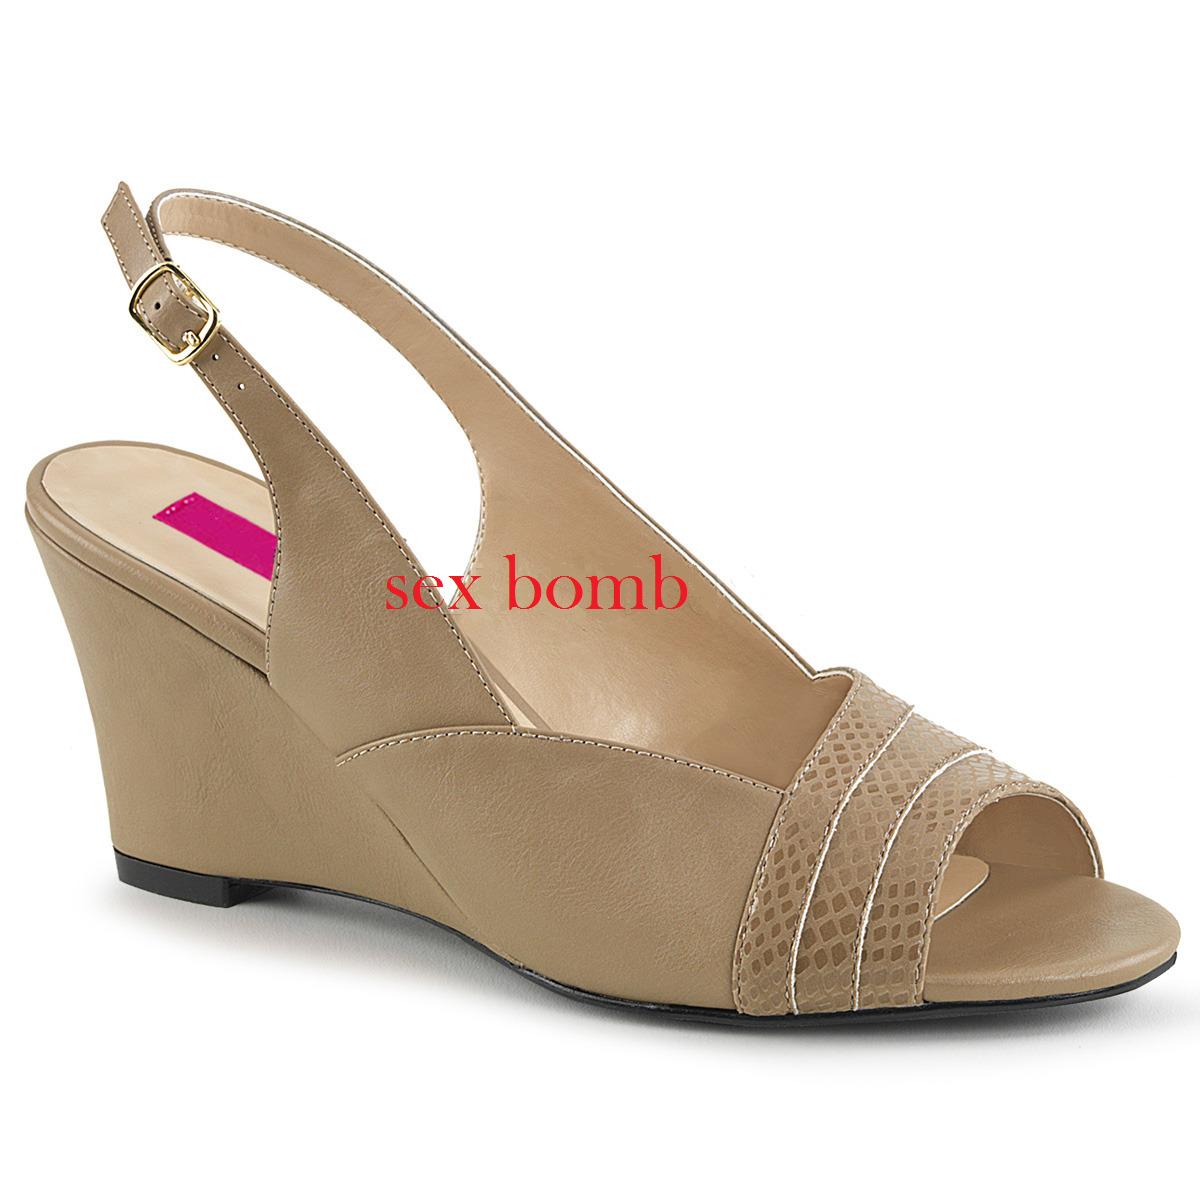 SANDALI tacco 7,5 ZEPPA dal 39 al 46 TORTORA OPACO cinturino scarpe SEXY glamour